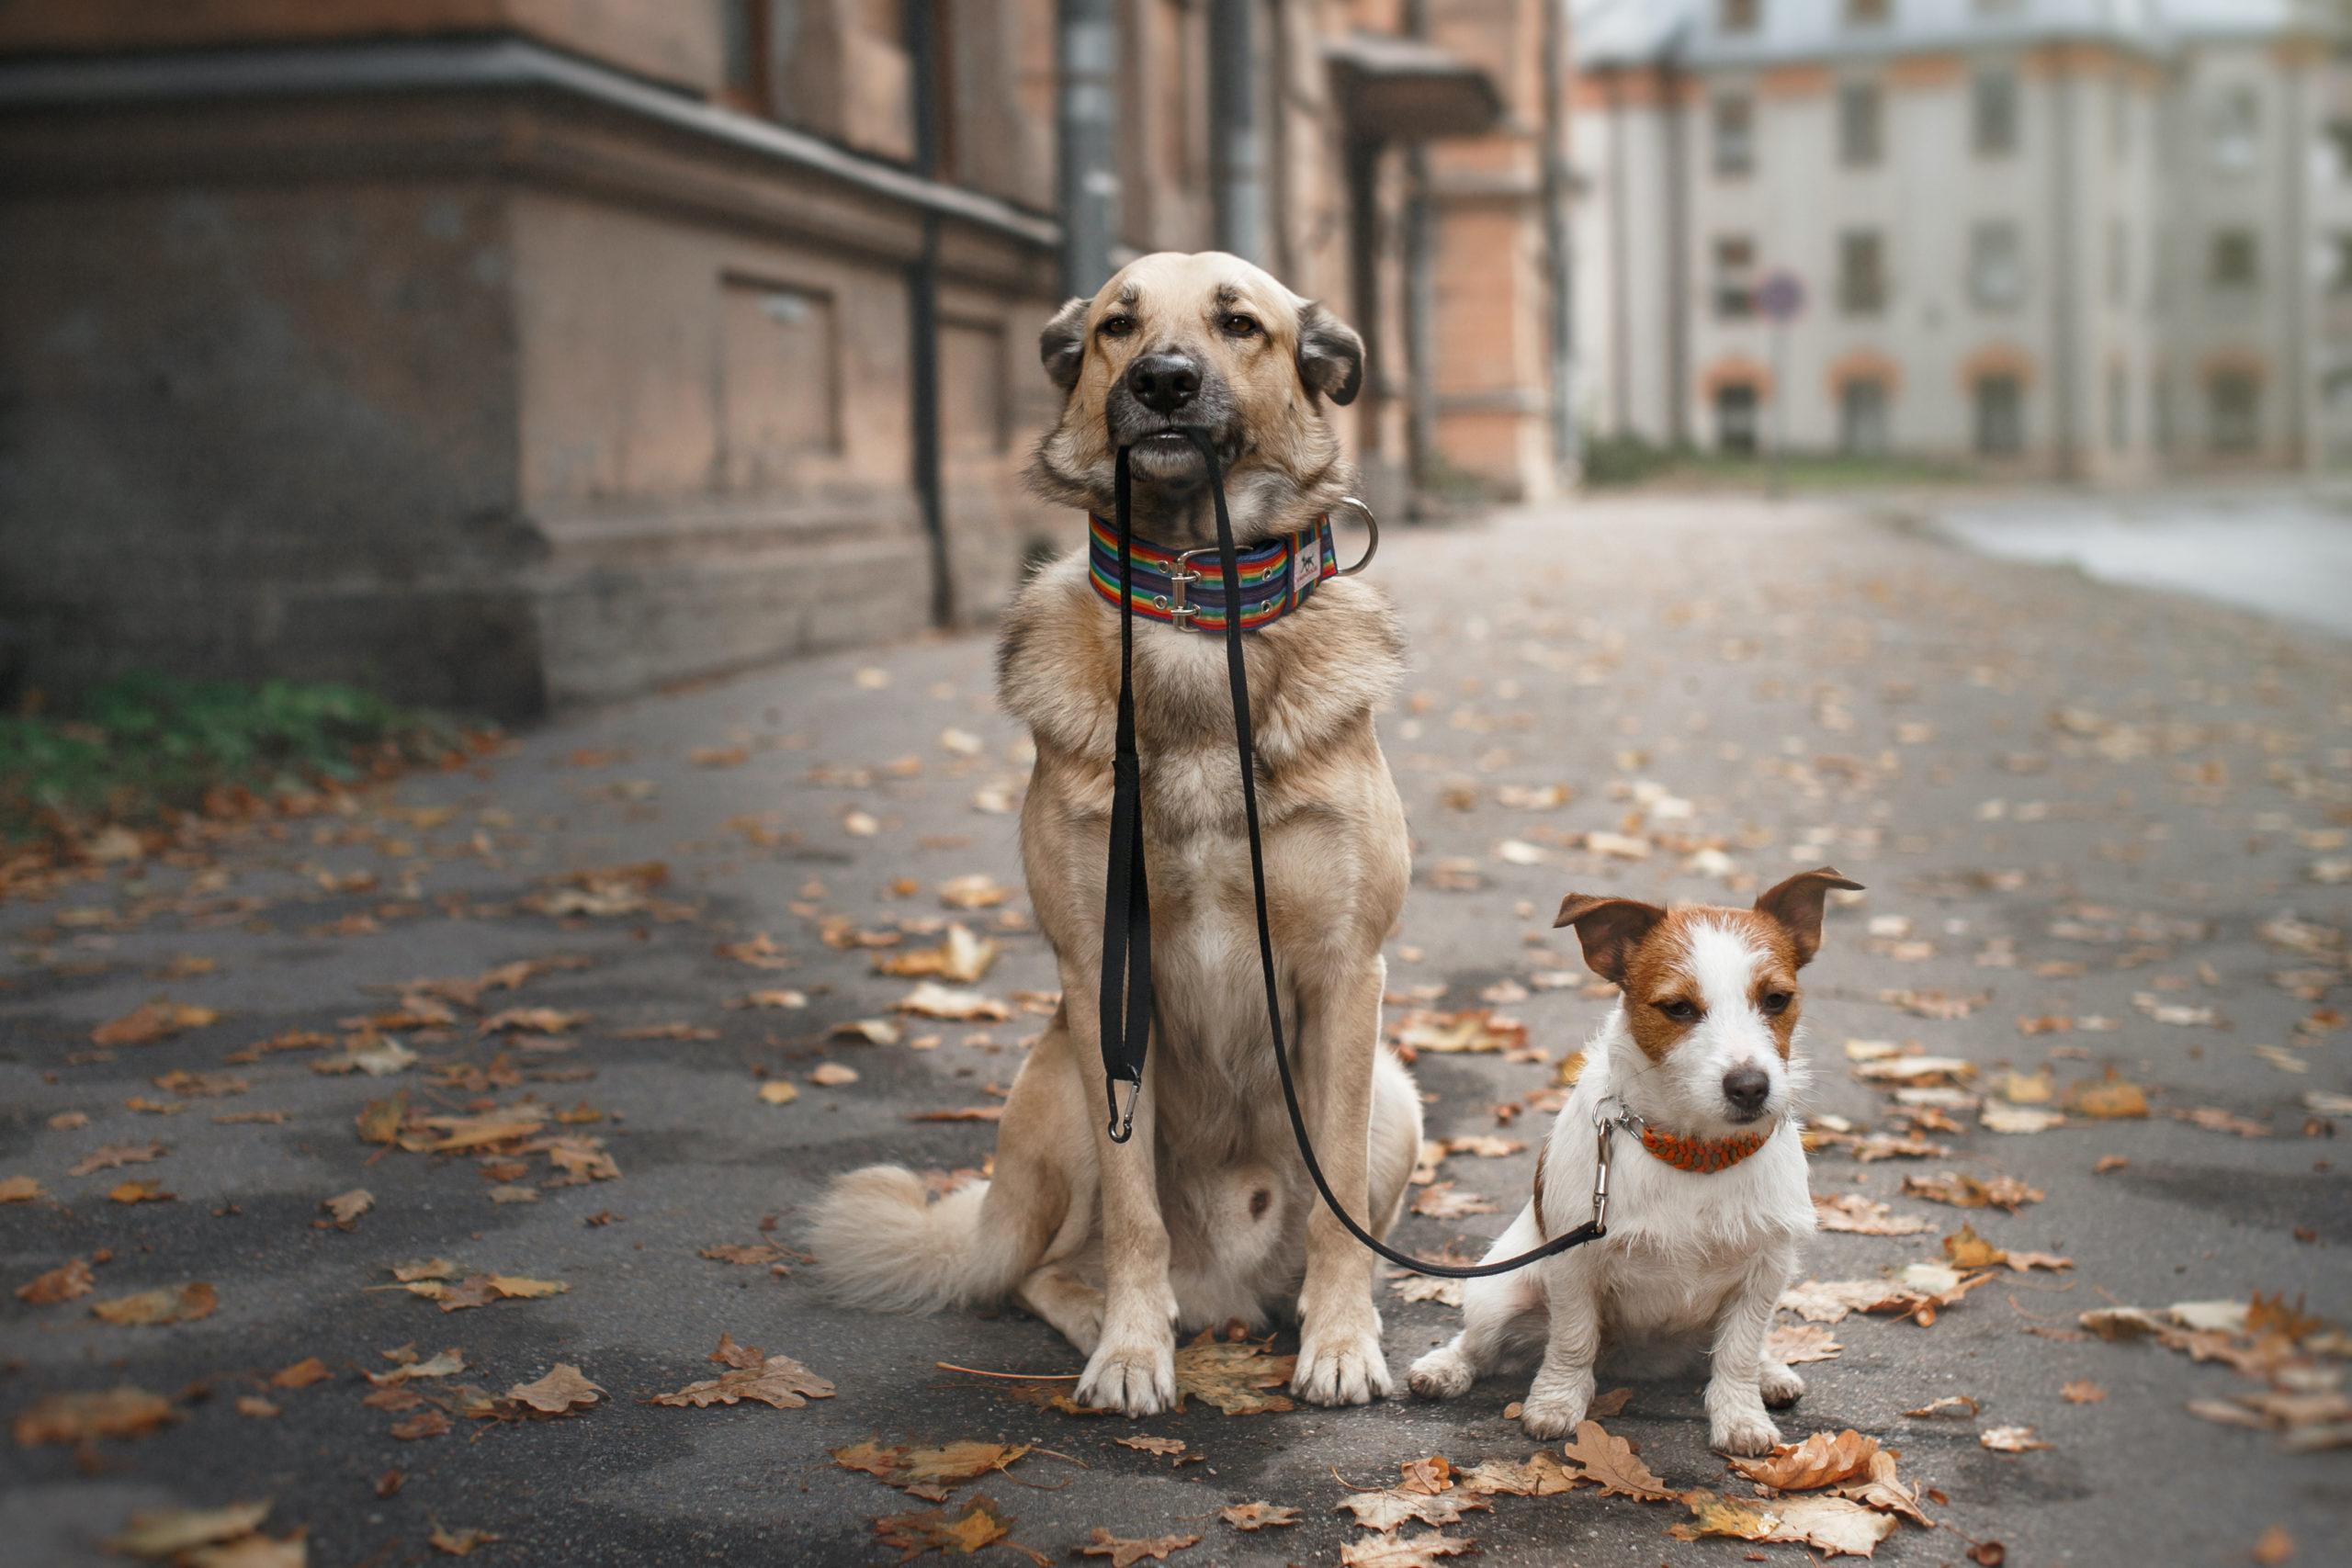 balade-2-chiens-en-ville-scaled.jpg